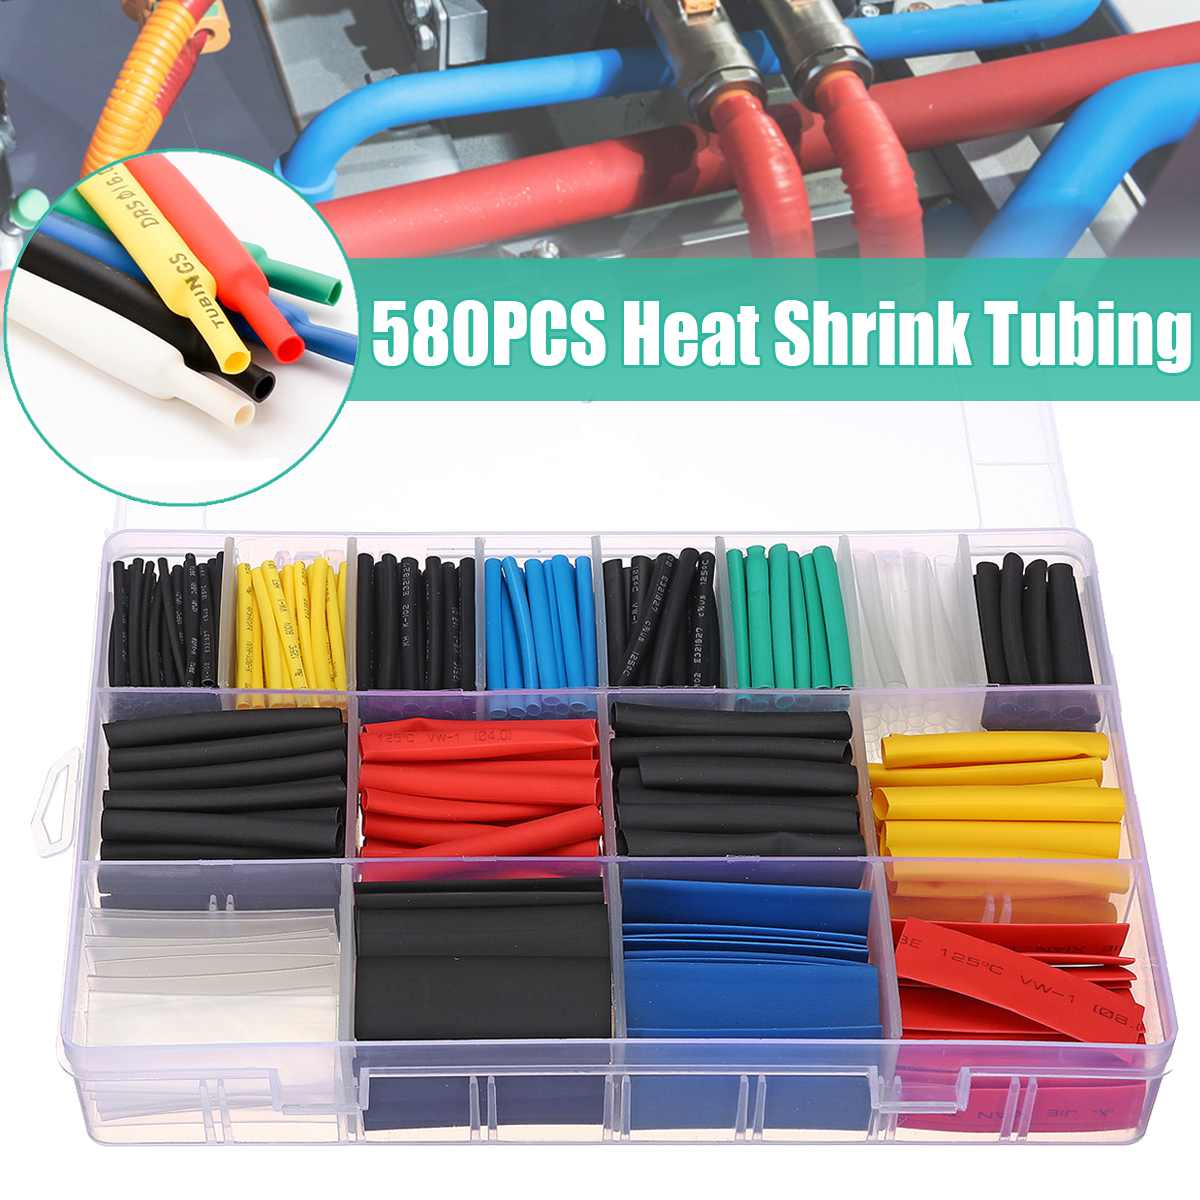 560pcs Heat Shrink Electrical Wire Cable Tubing Tube Sleeve Wrap Shrinkage Kit